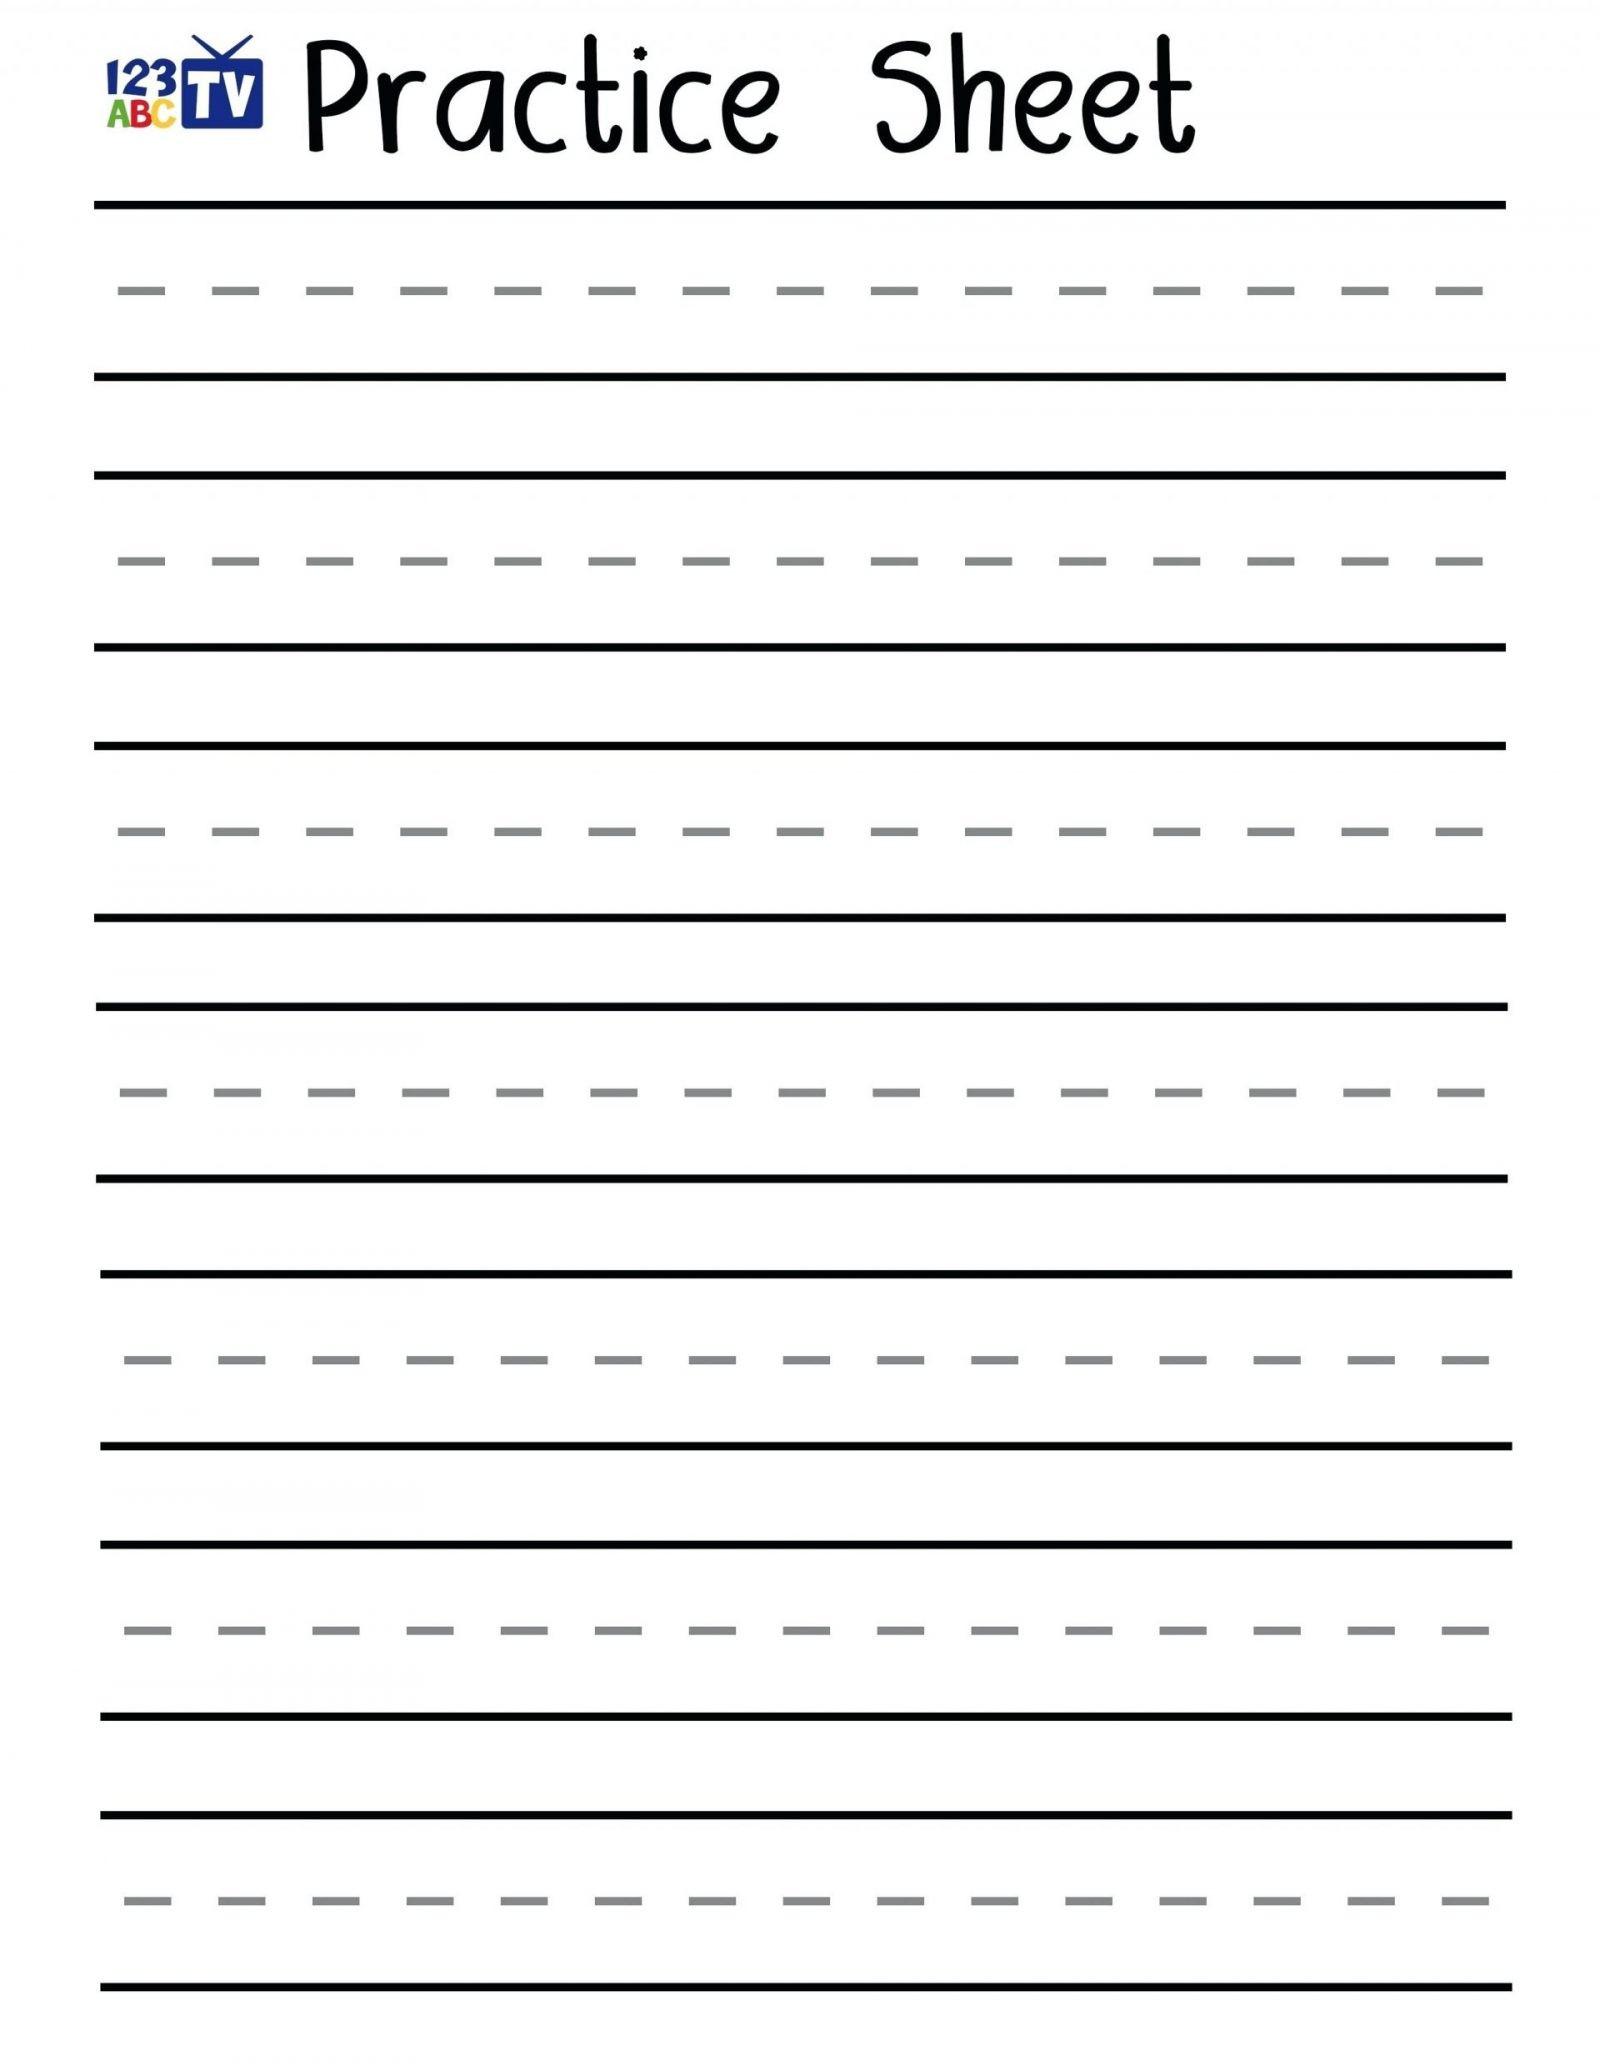 Free Printable Handwriting Sheets For Kindergarten | Free Printables | Free Printable Handwriting Worksheets For Preschool